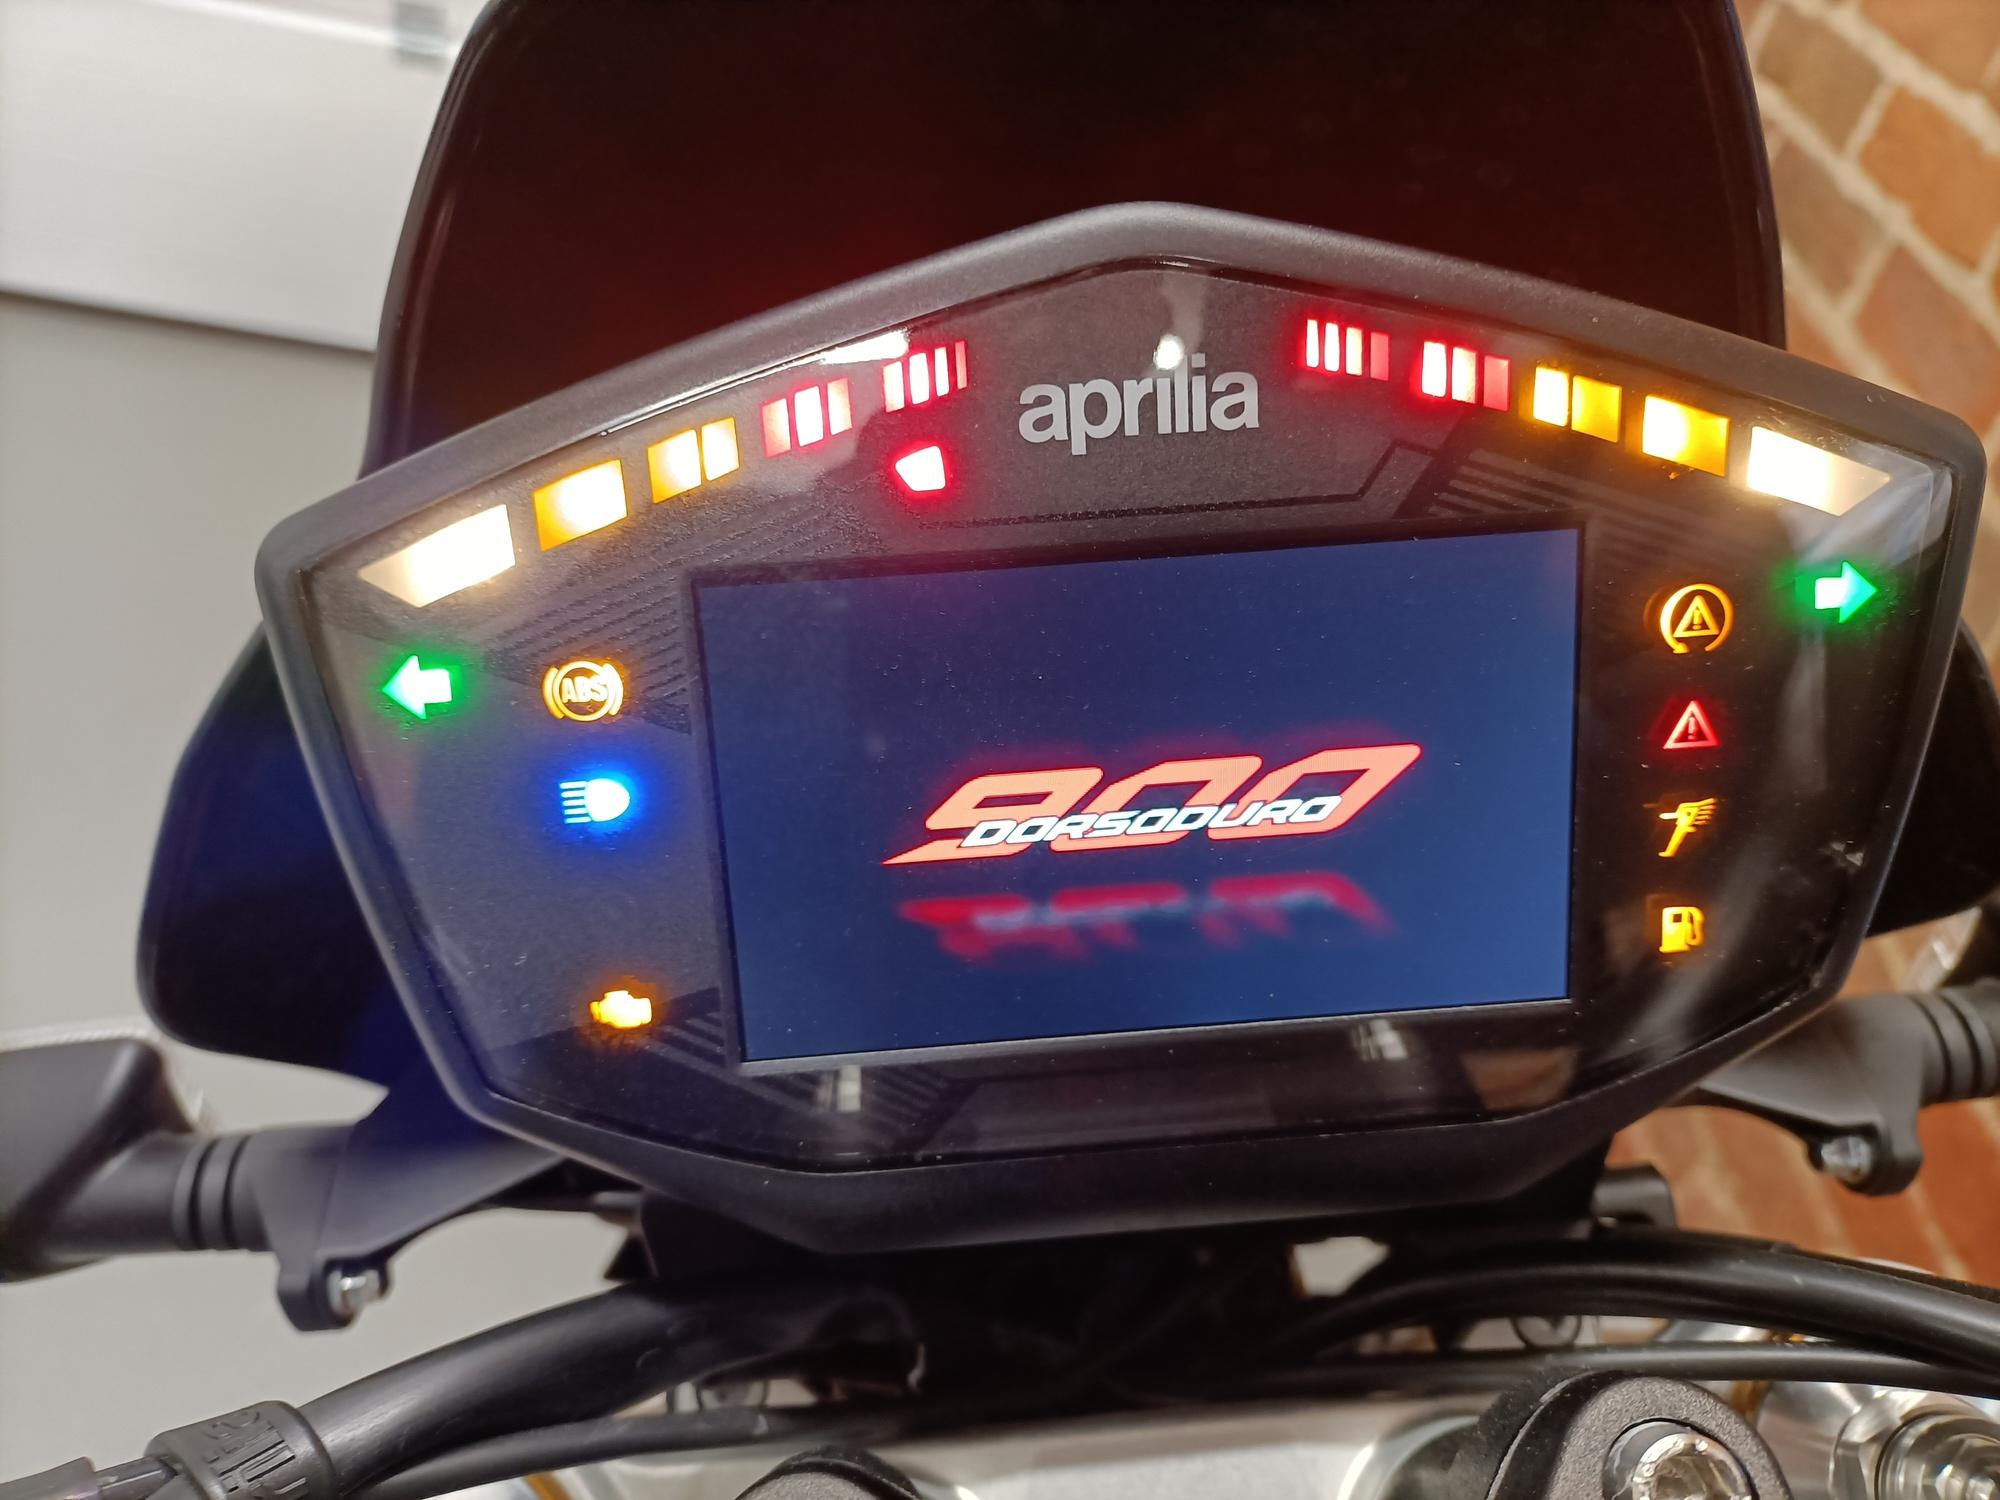 "2020/70 APRILIA DORSODURO 900 28 MILES ONLY ""OUT OF THE BOX CONDITION"""